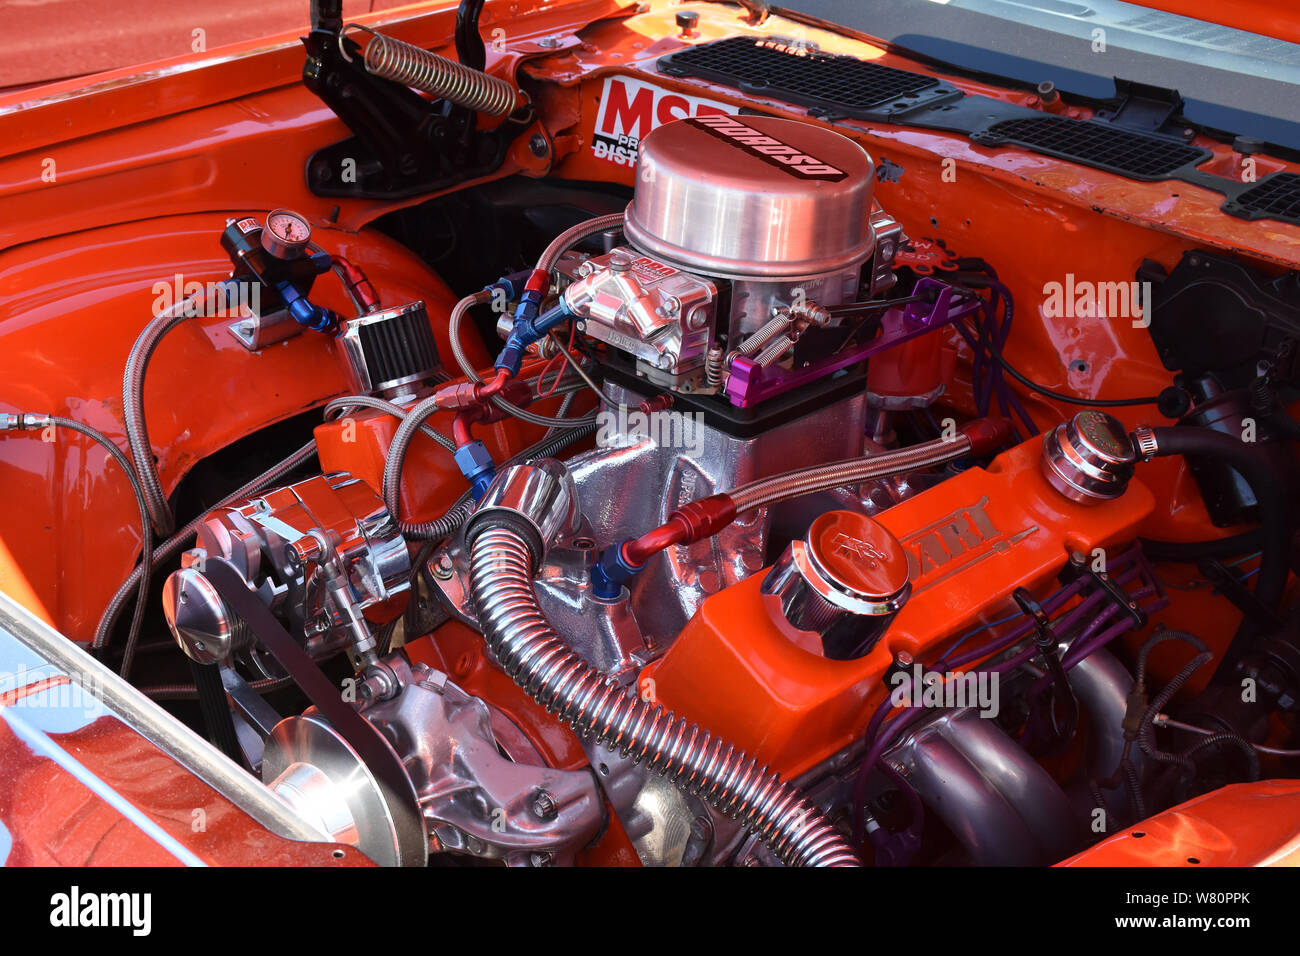 Chevrolet 350 Stock Photos & Chevrolet 350 Stock Images - Alamy